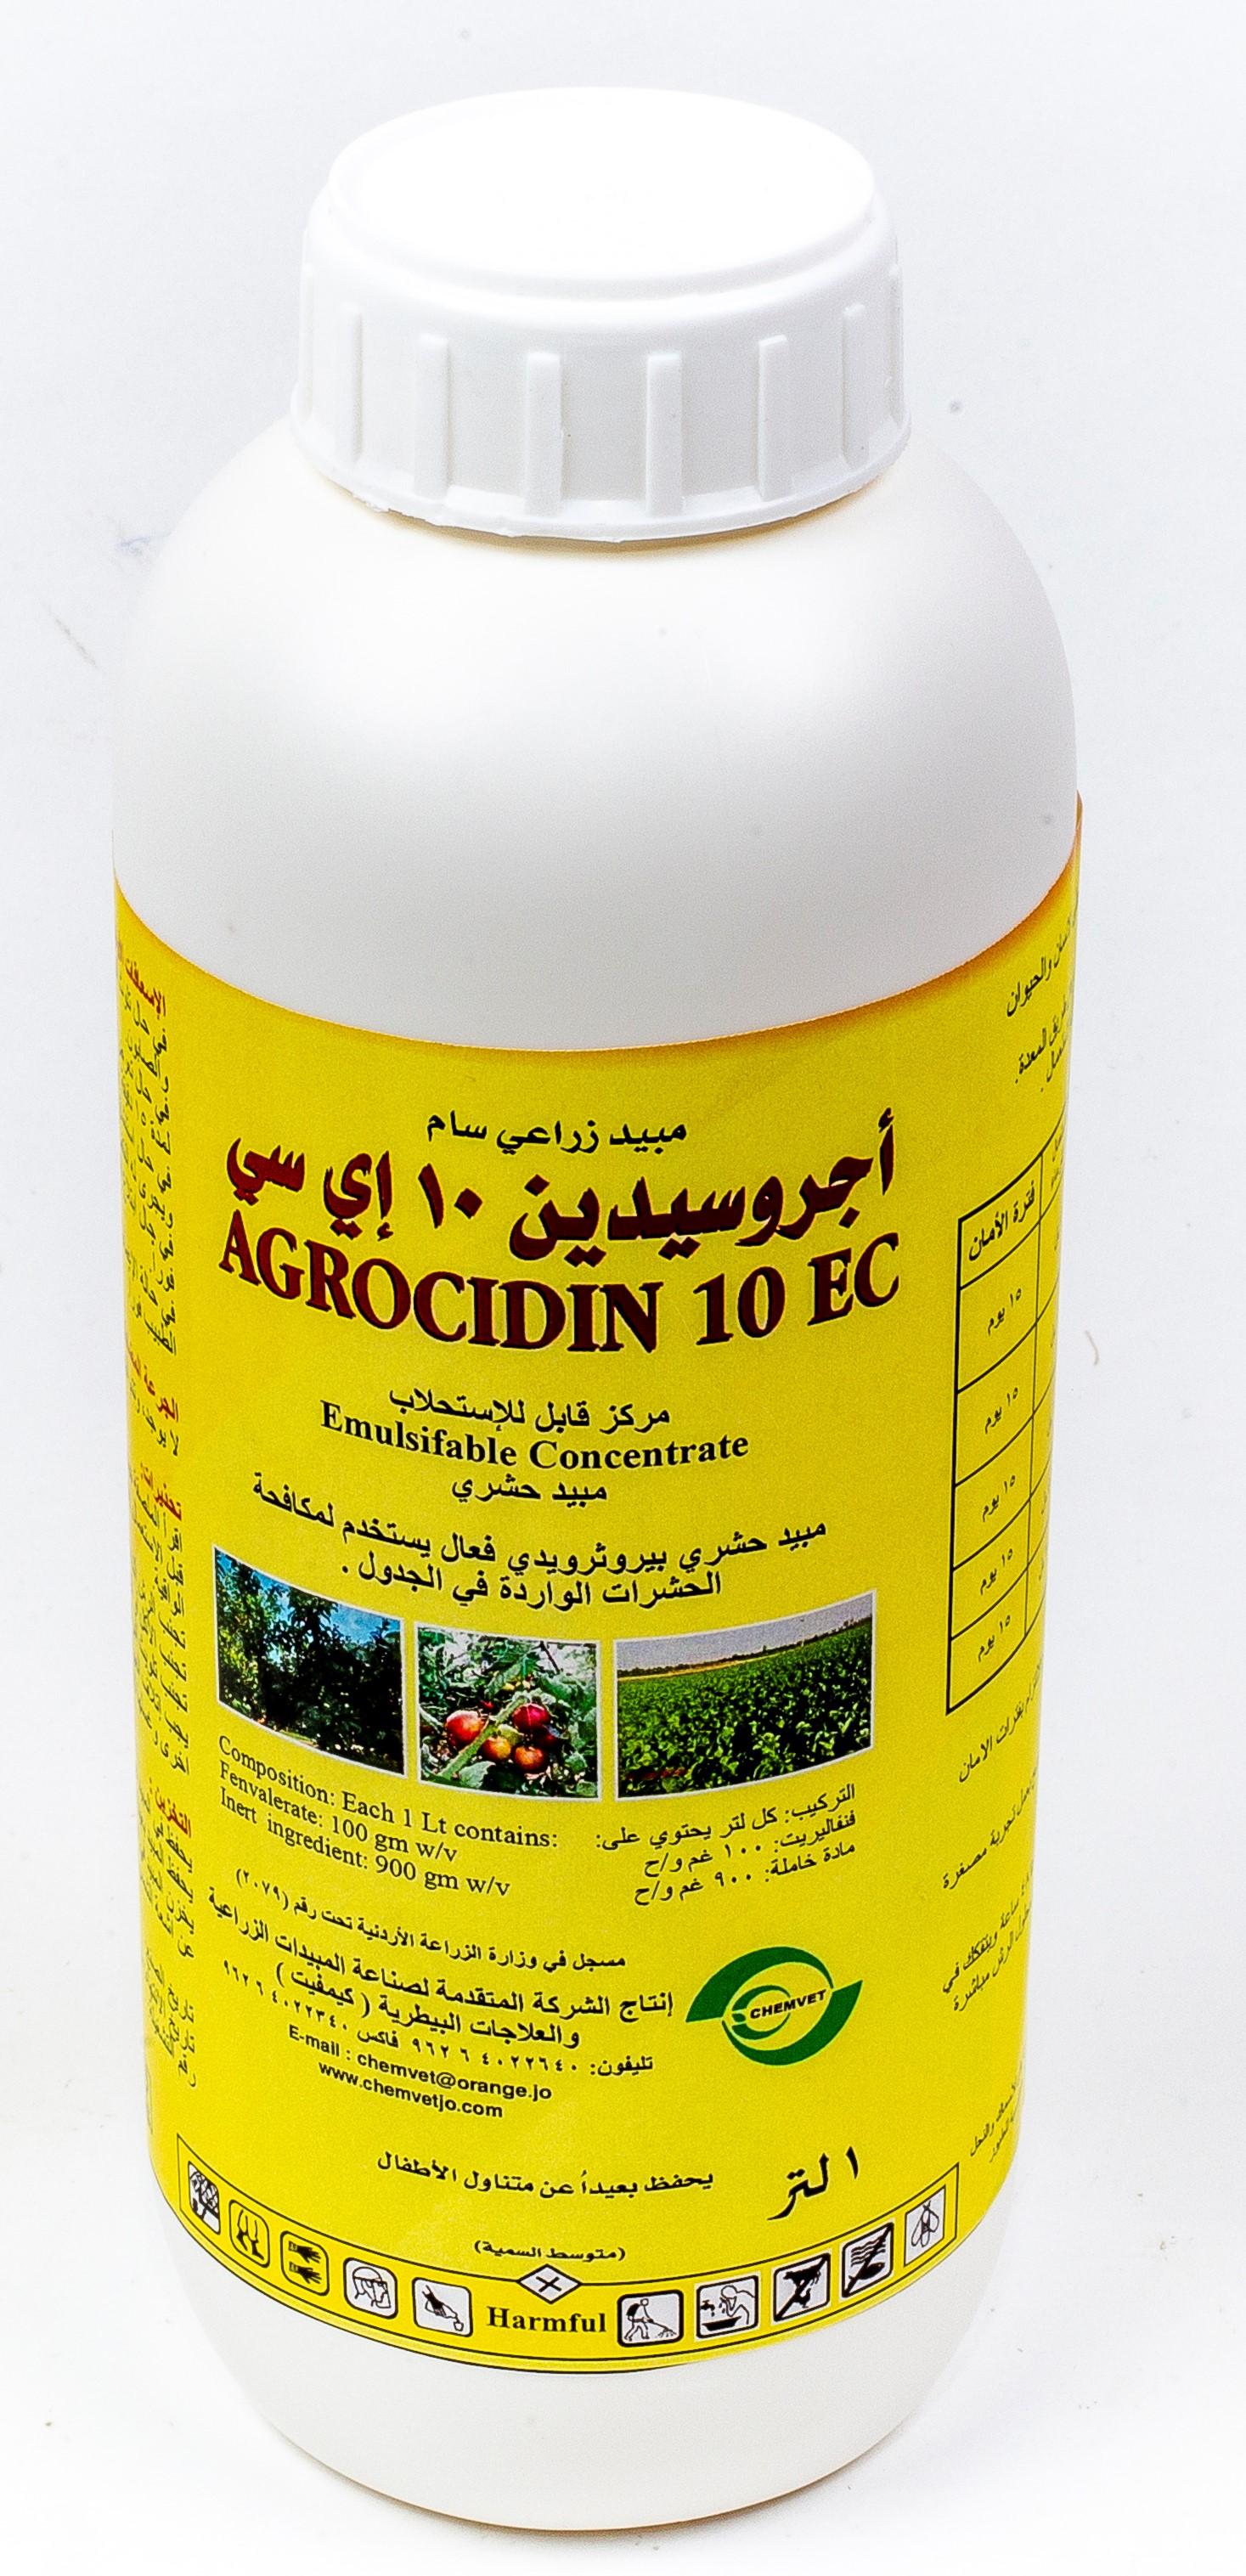 Agrocidin 10 EC